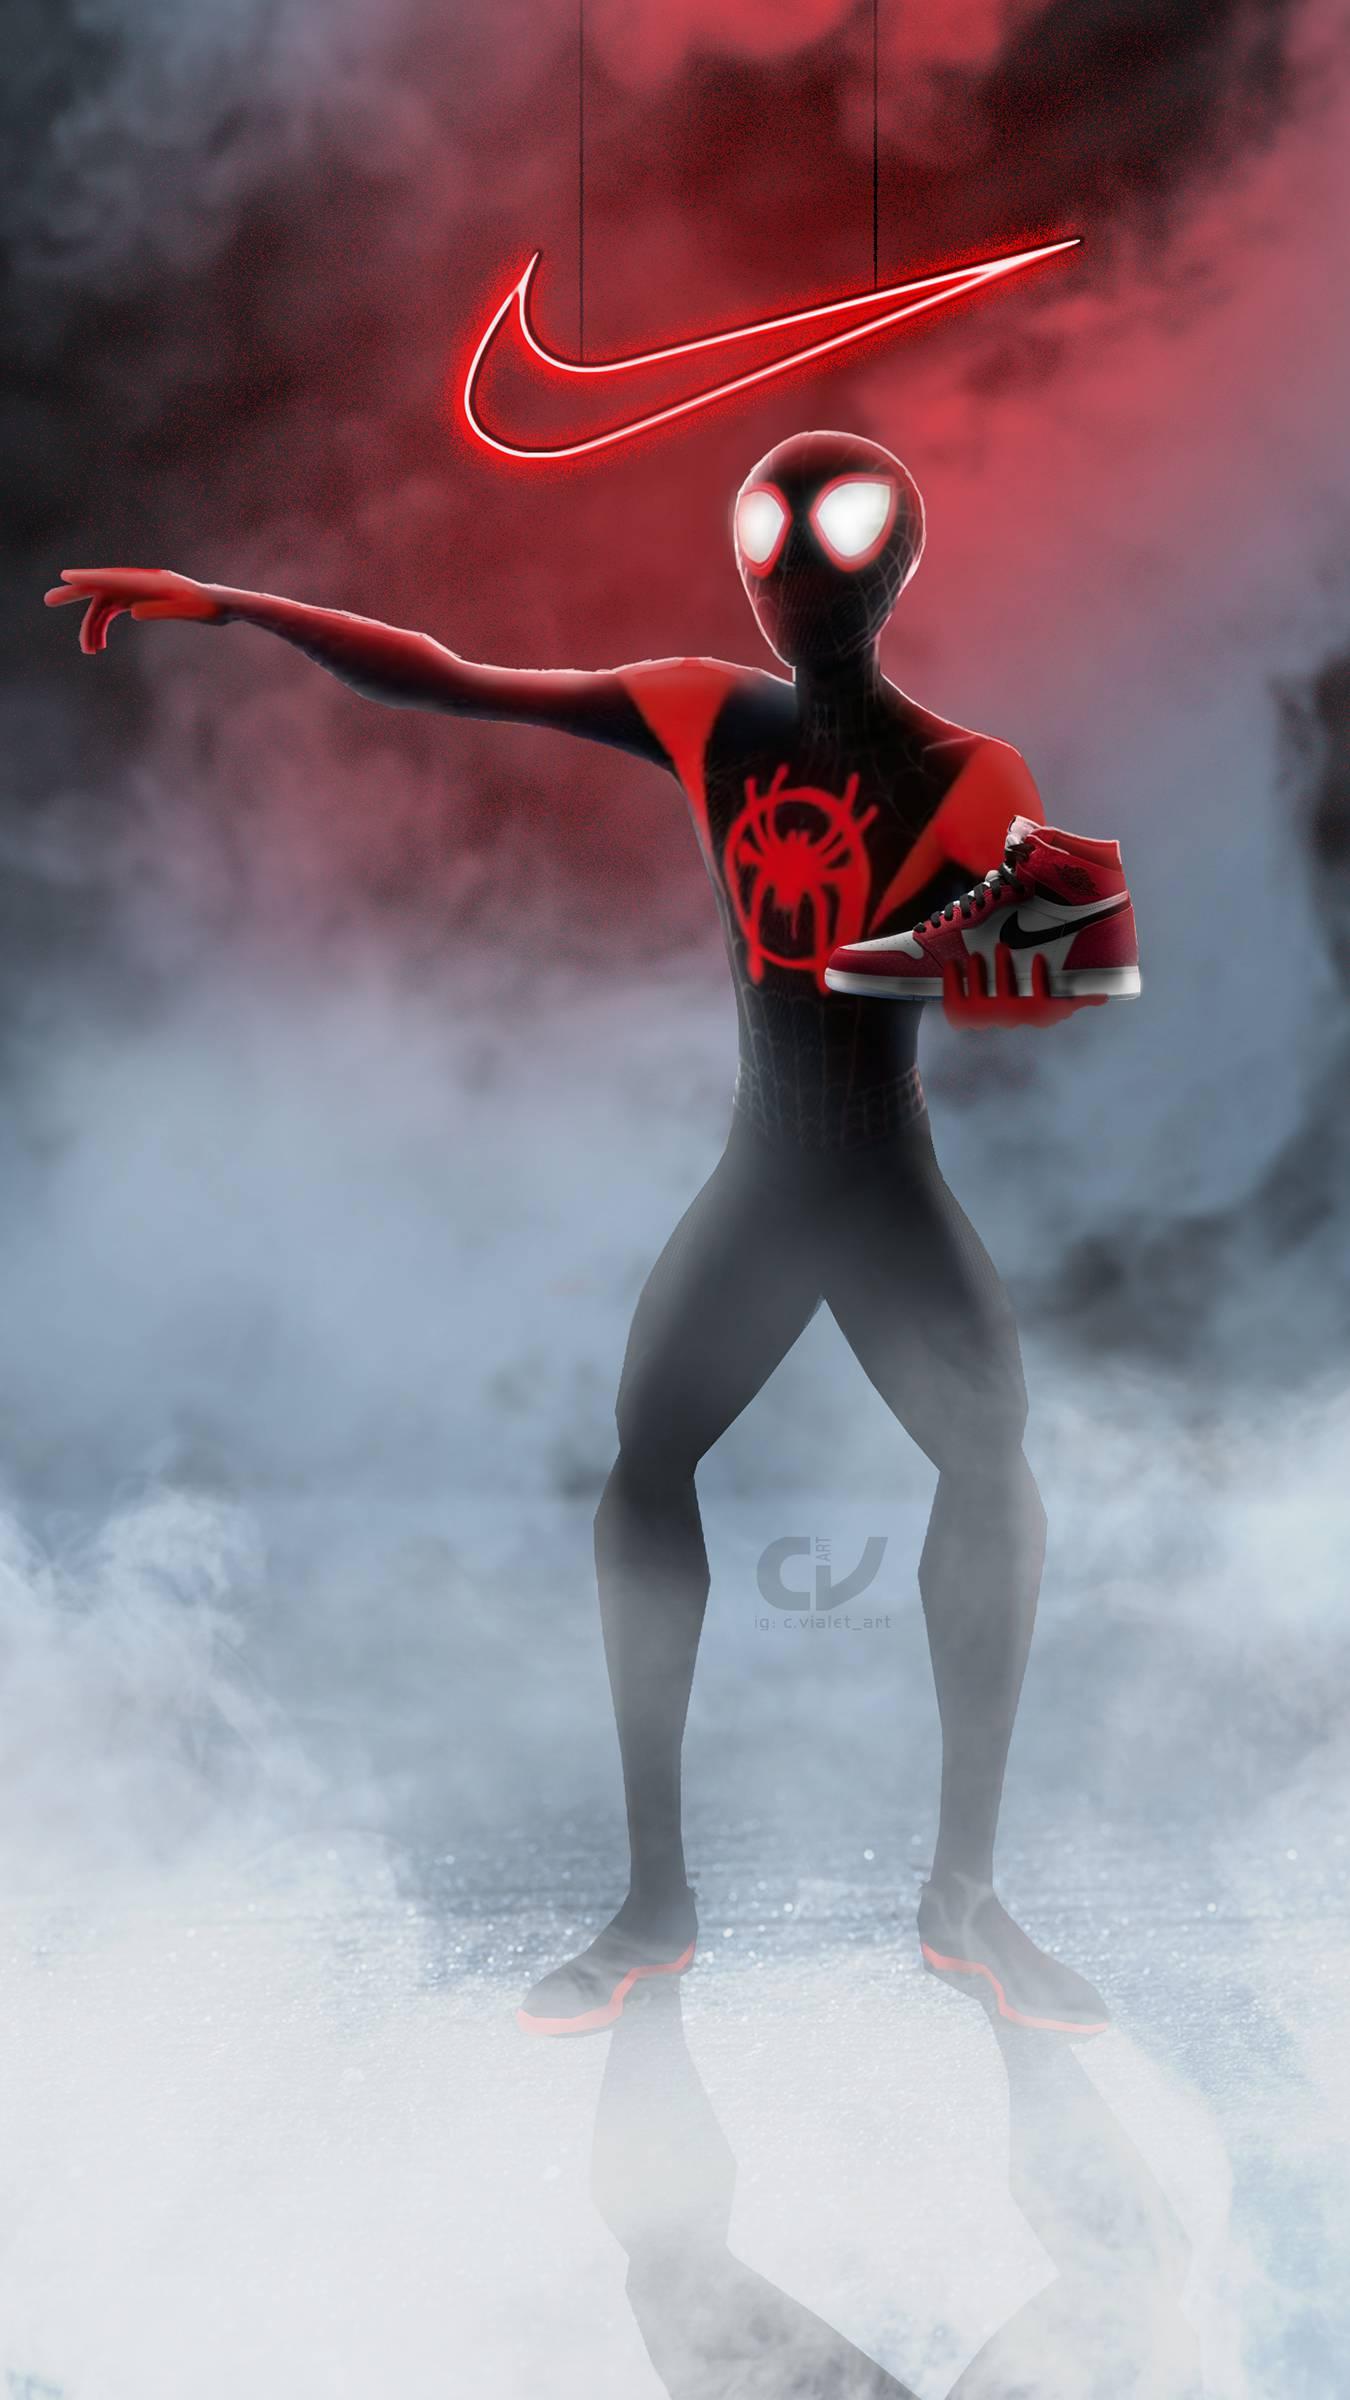 Spiderman Nike iPhone Wallpaper